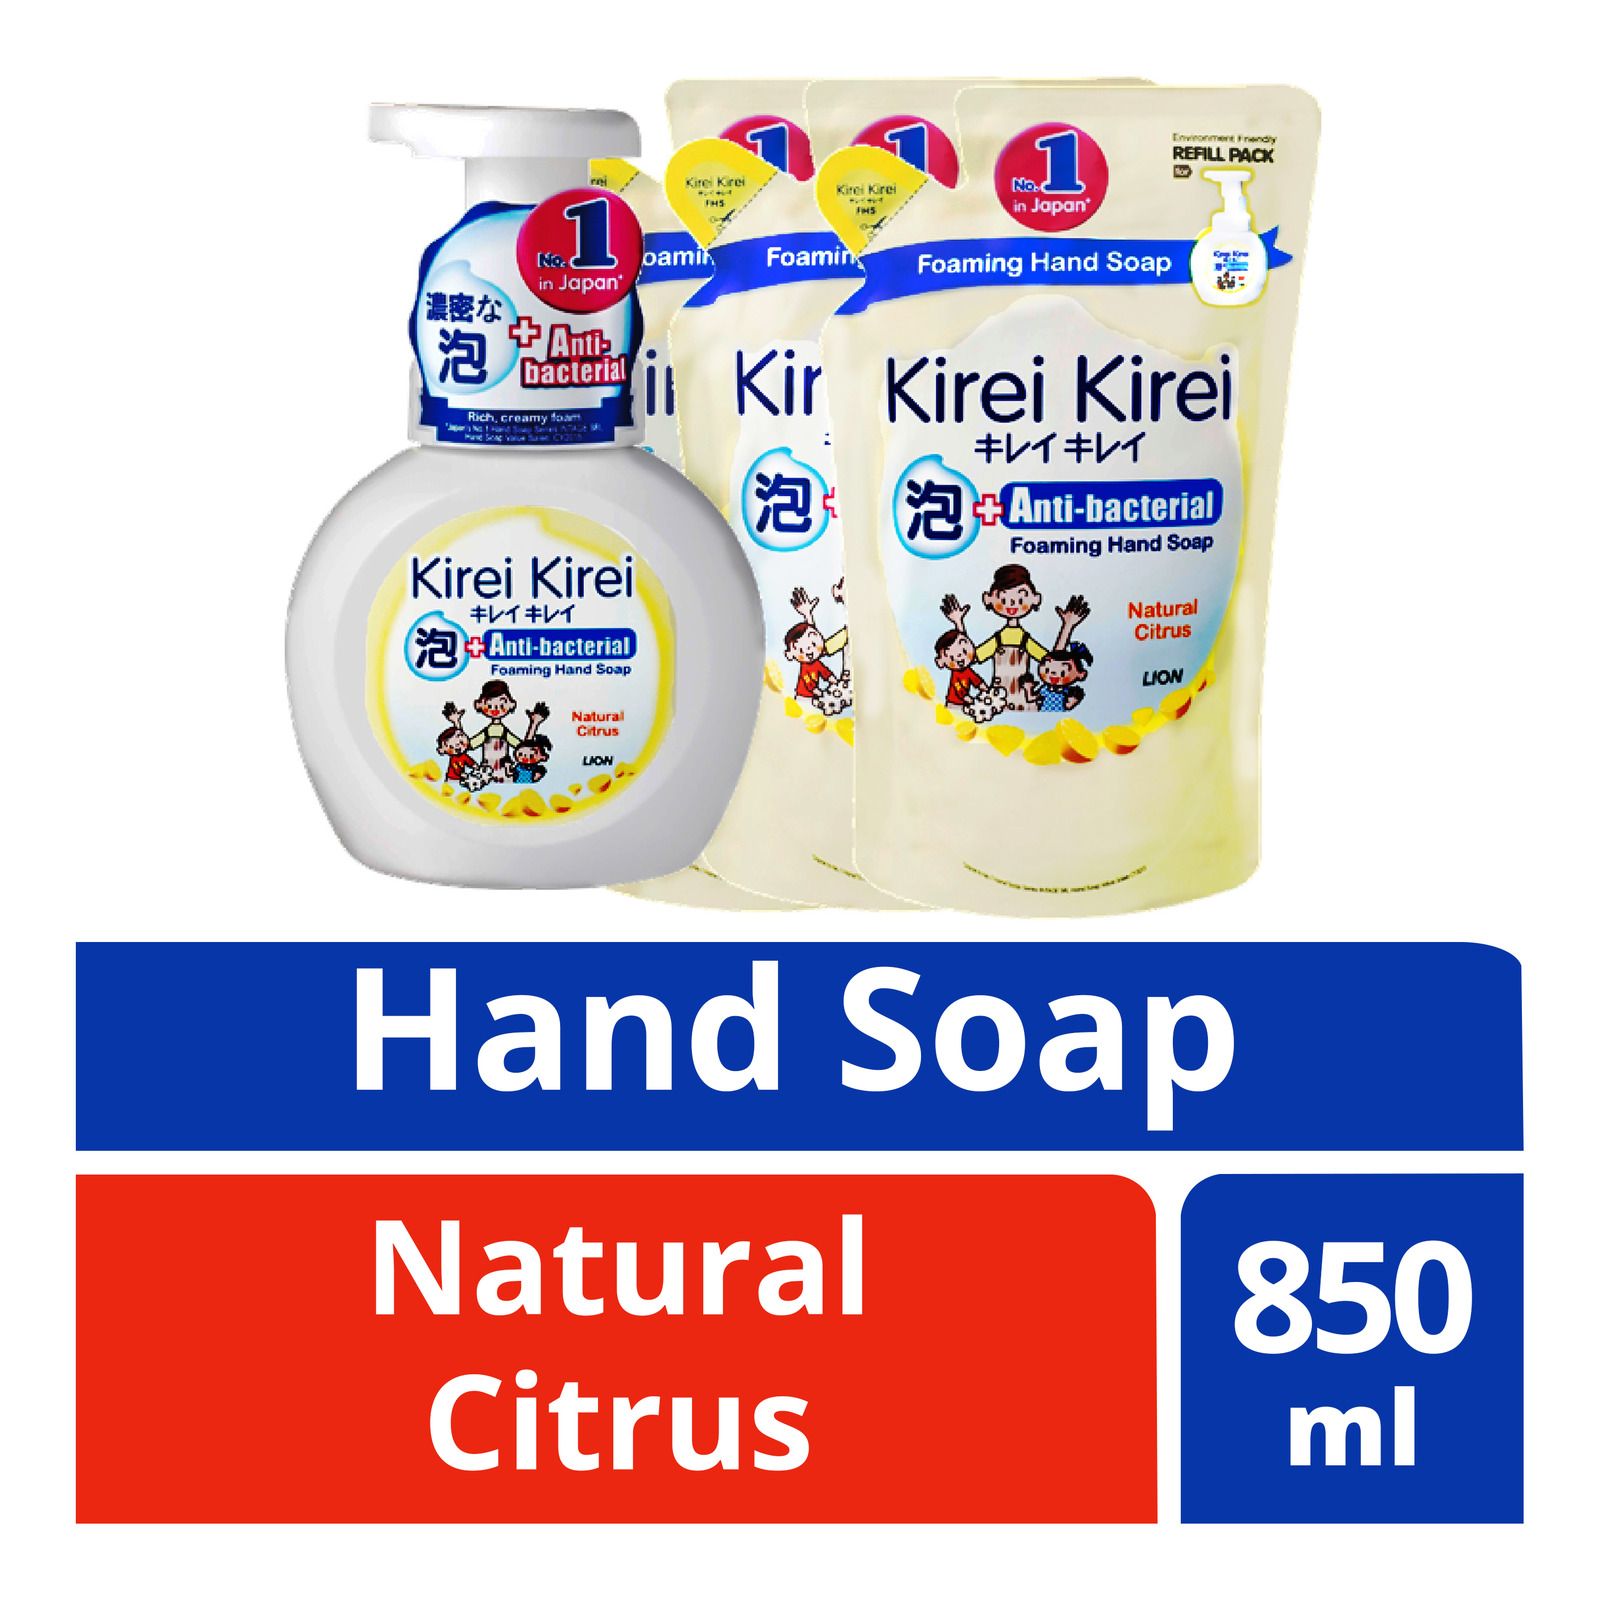 Kirei Kirei Anti-bacterial Hand Soap - Citrus